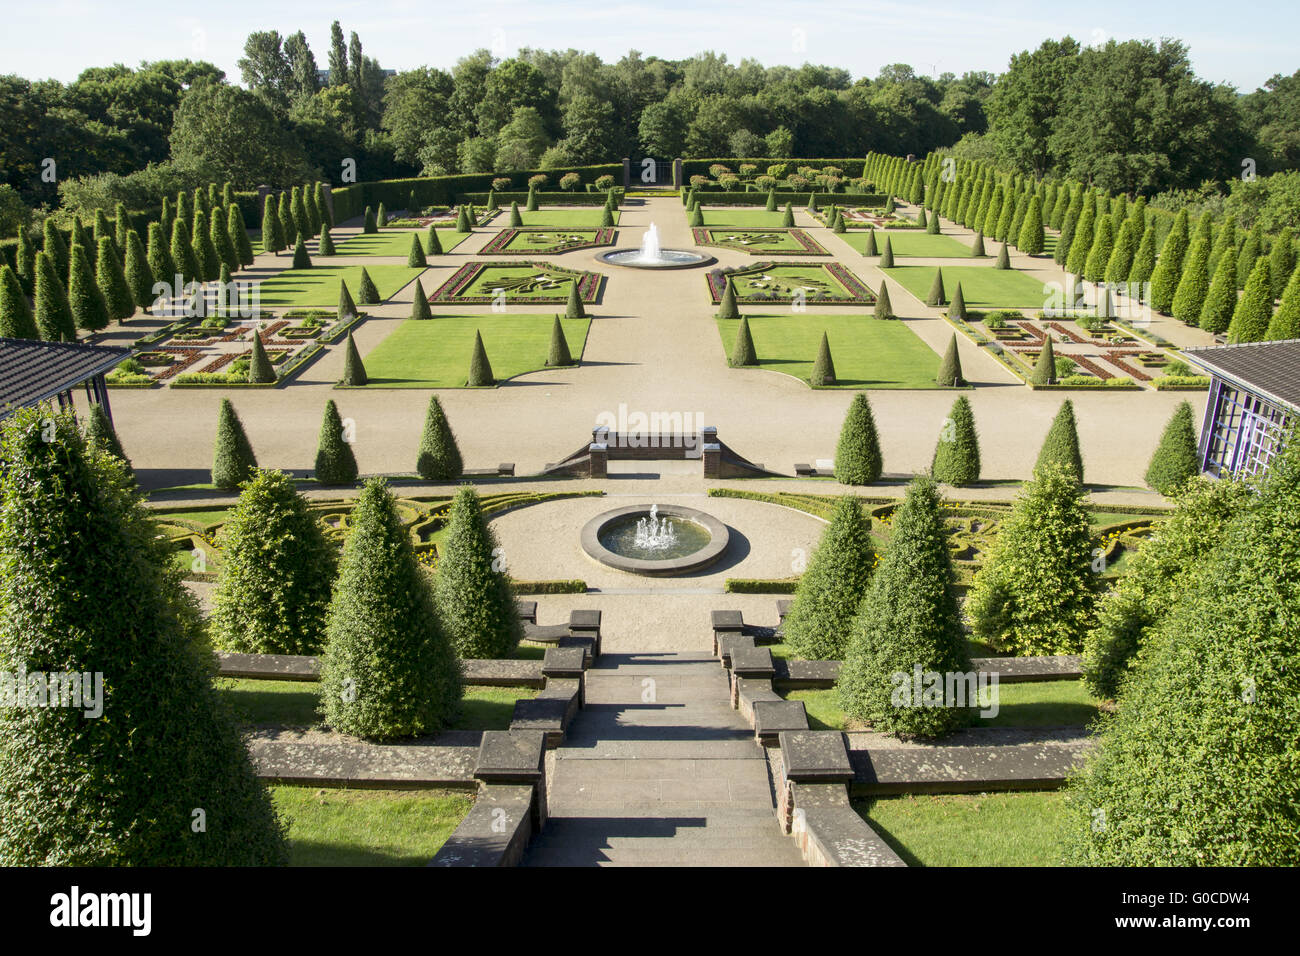 Baroque garden Abbey Kamp, Kamp-Lintfort, Germany - Stock Image